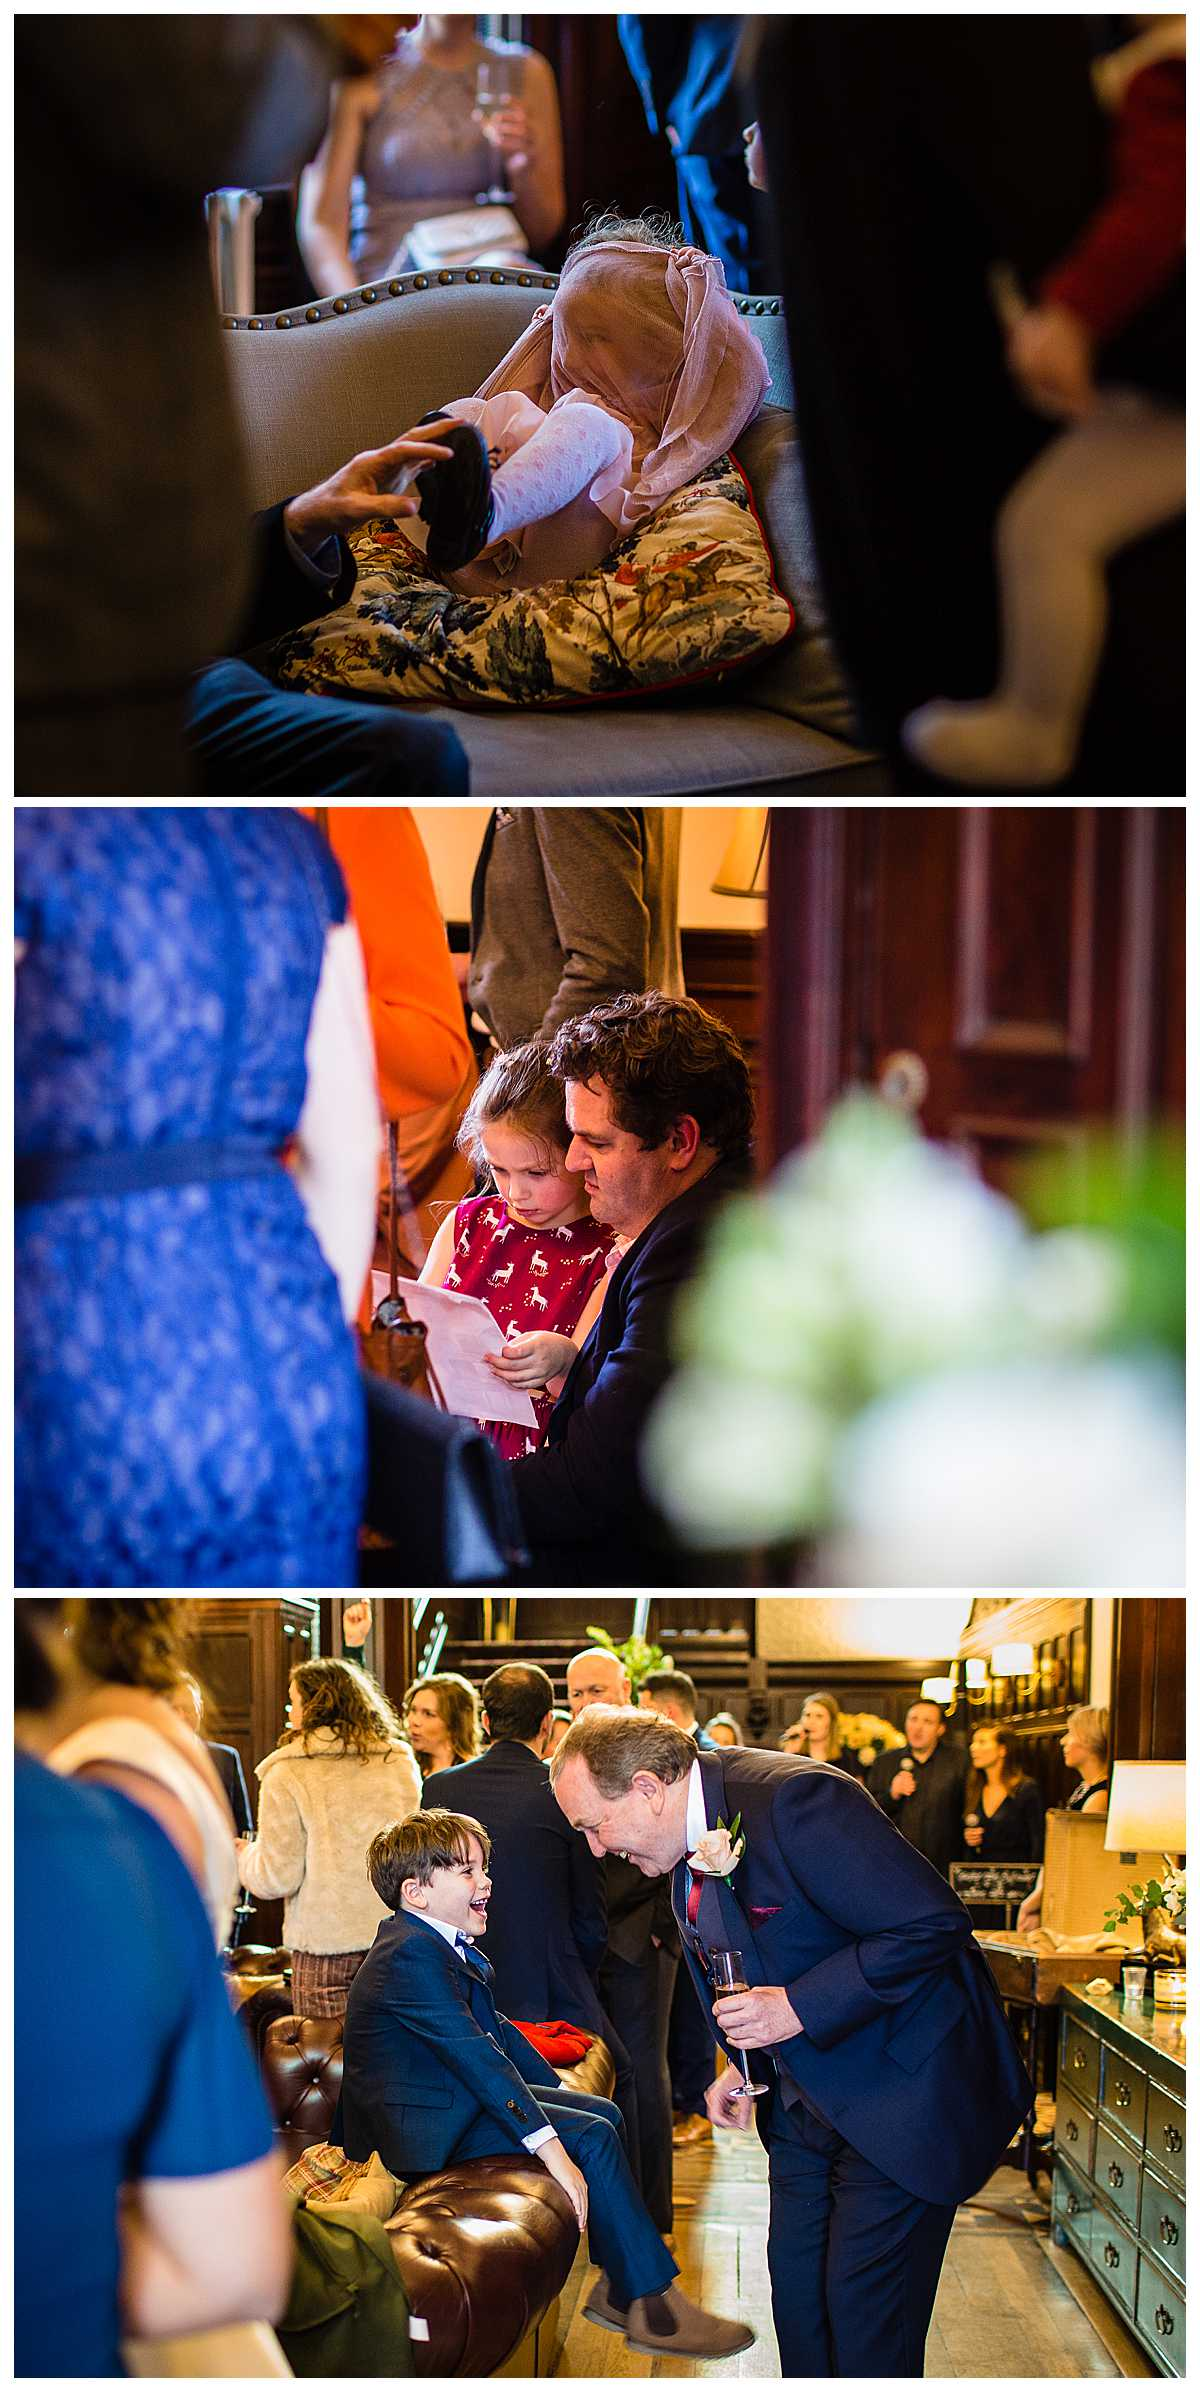 various guests candids enjoying themselves at tyn dwr hall wedding llangollen